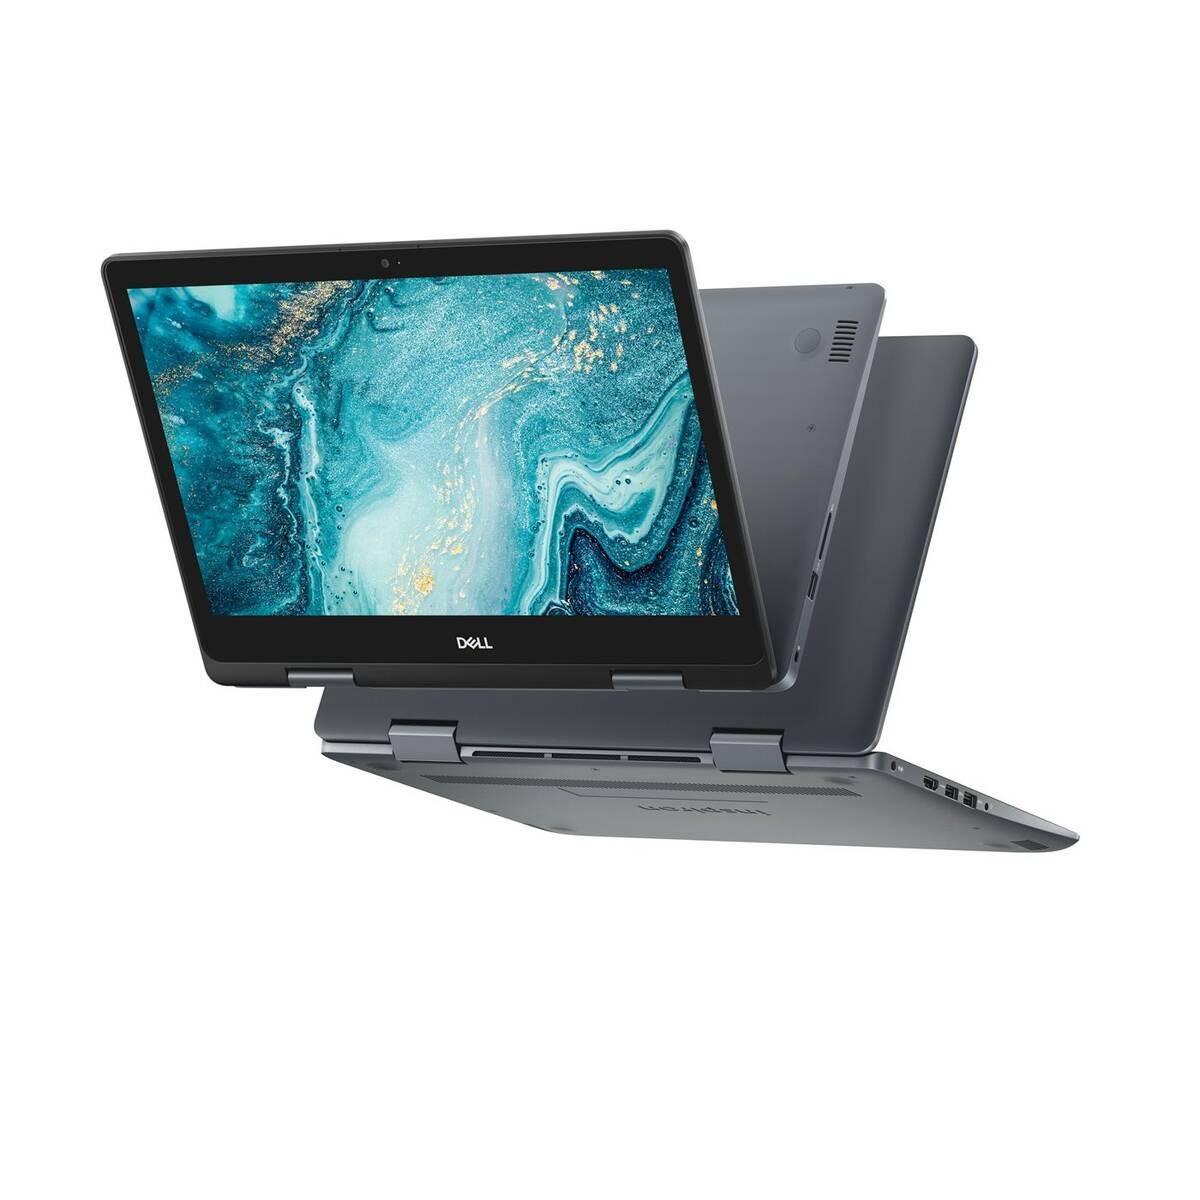 Dell IFA 2018 laptop inspiron 14 5481 s